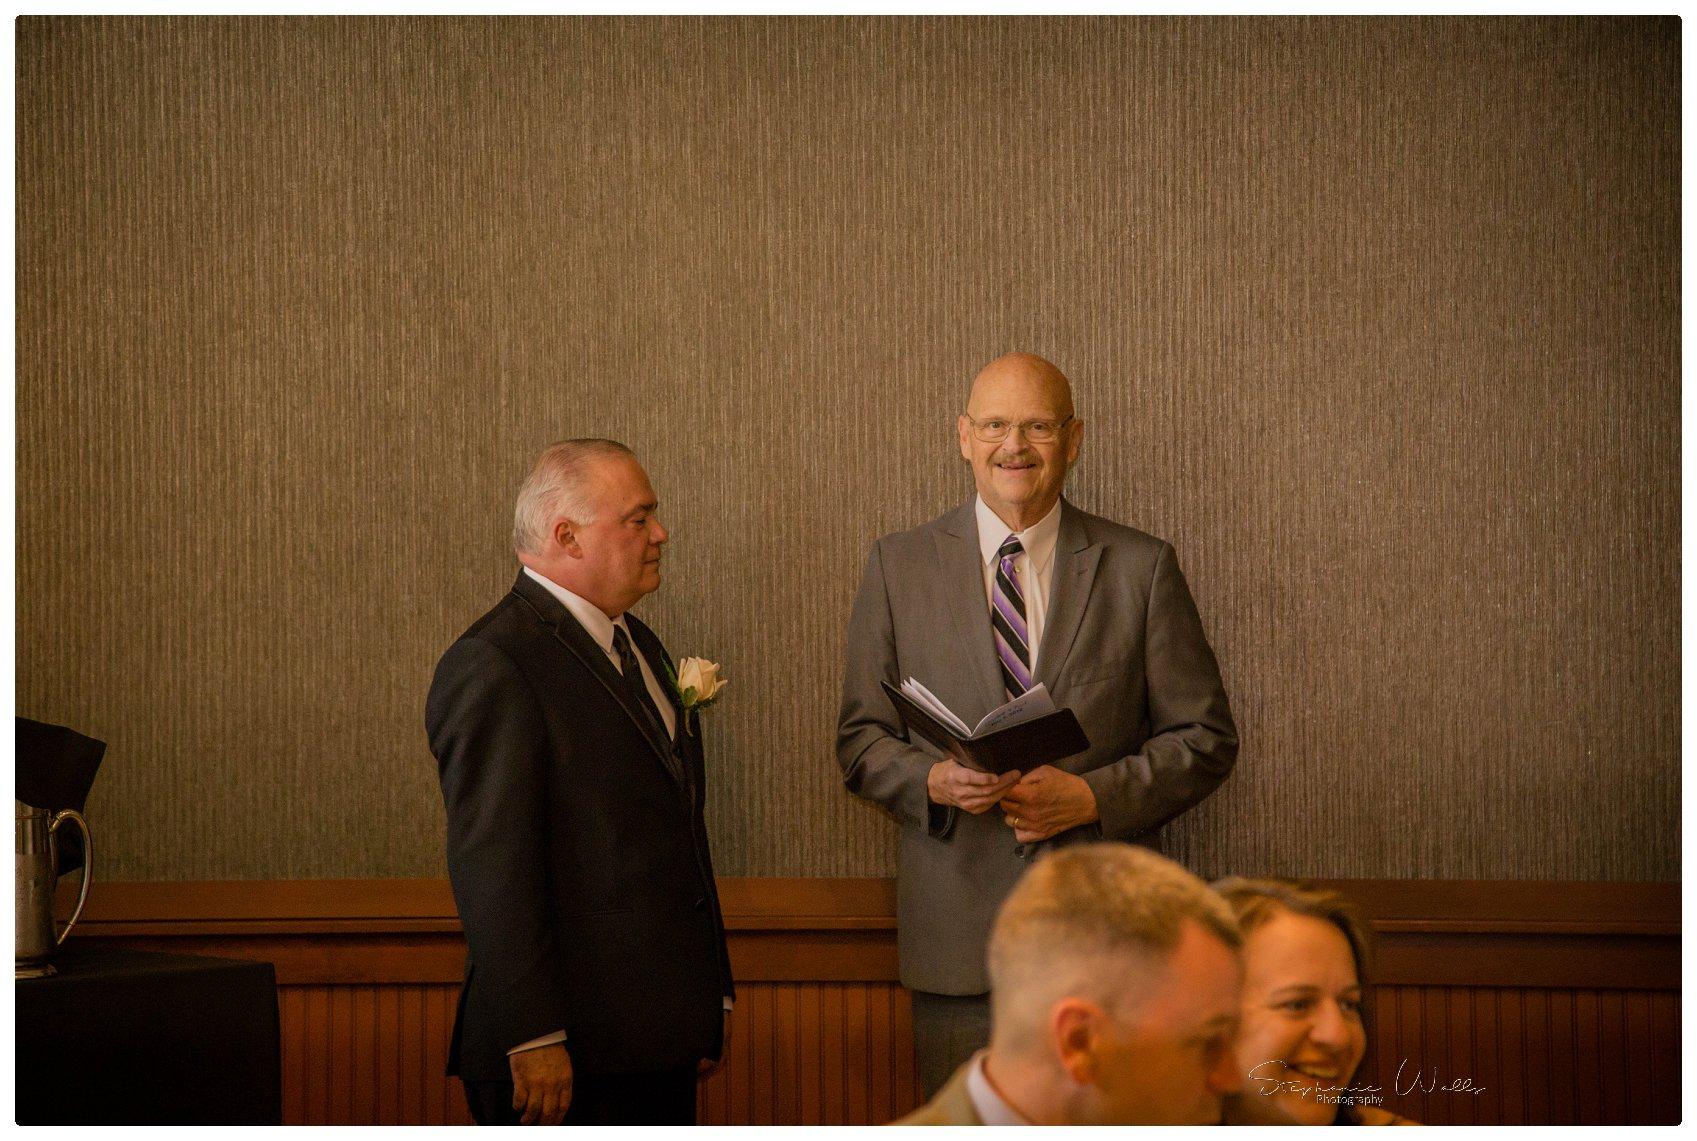 Portraits Ceremony 080 Salish Lodge & Spa    Elopement With Liz and Paul